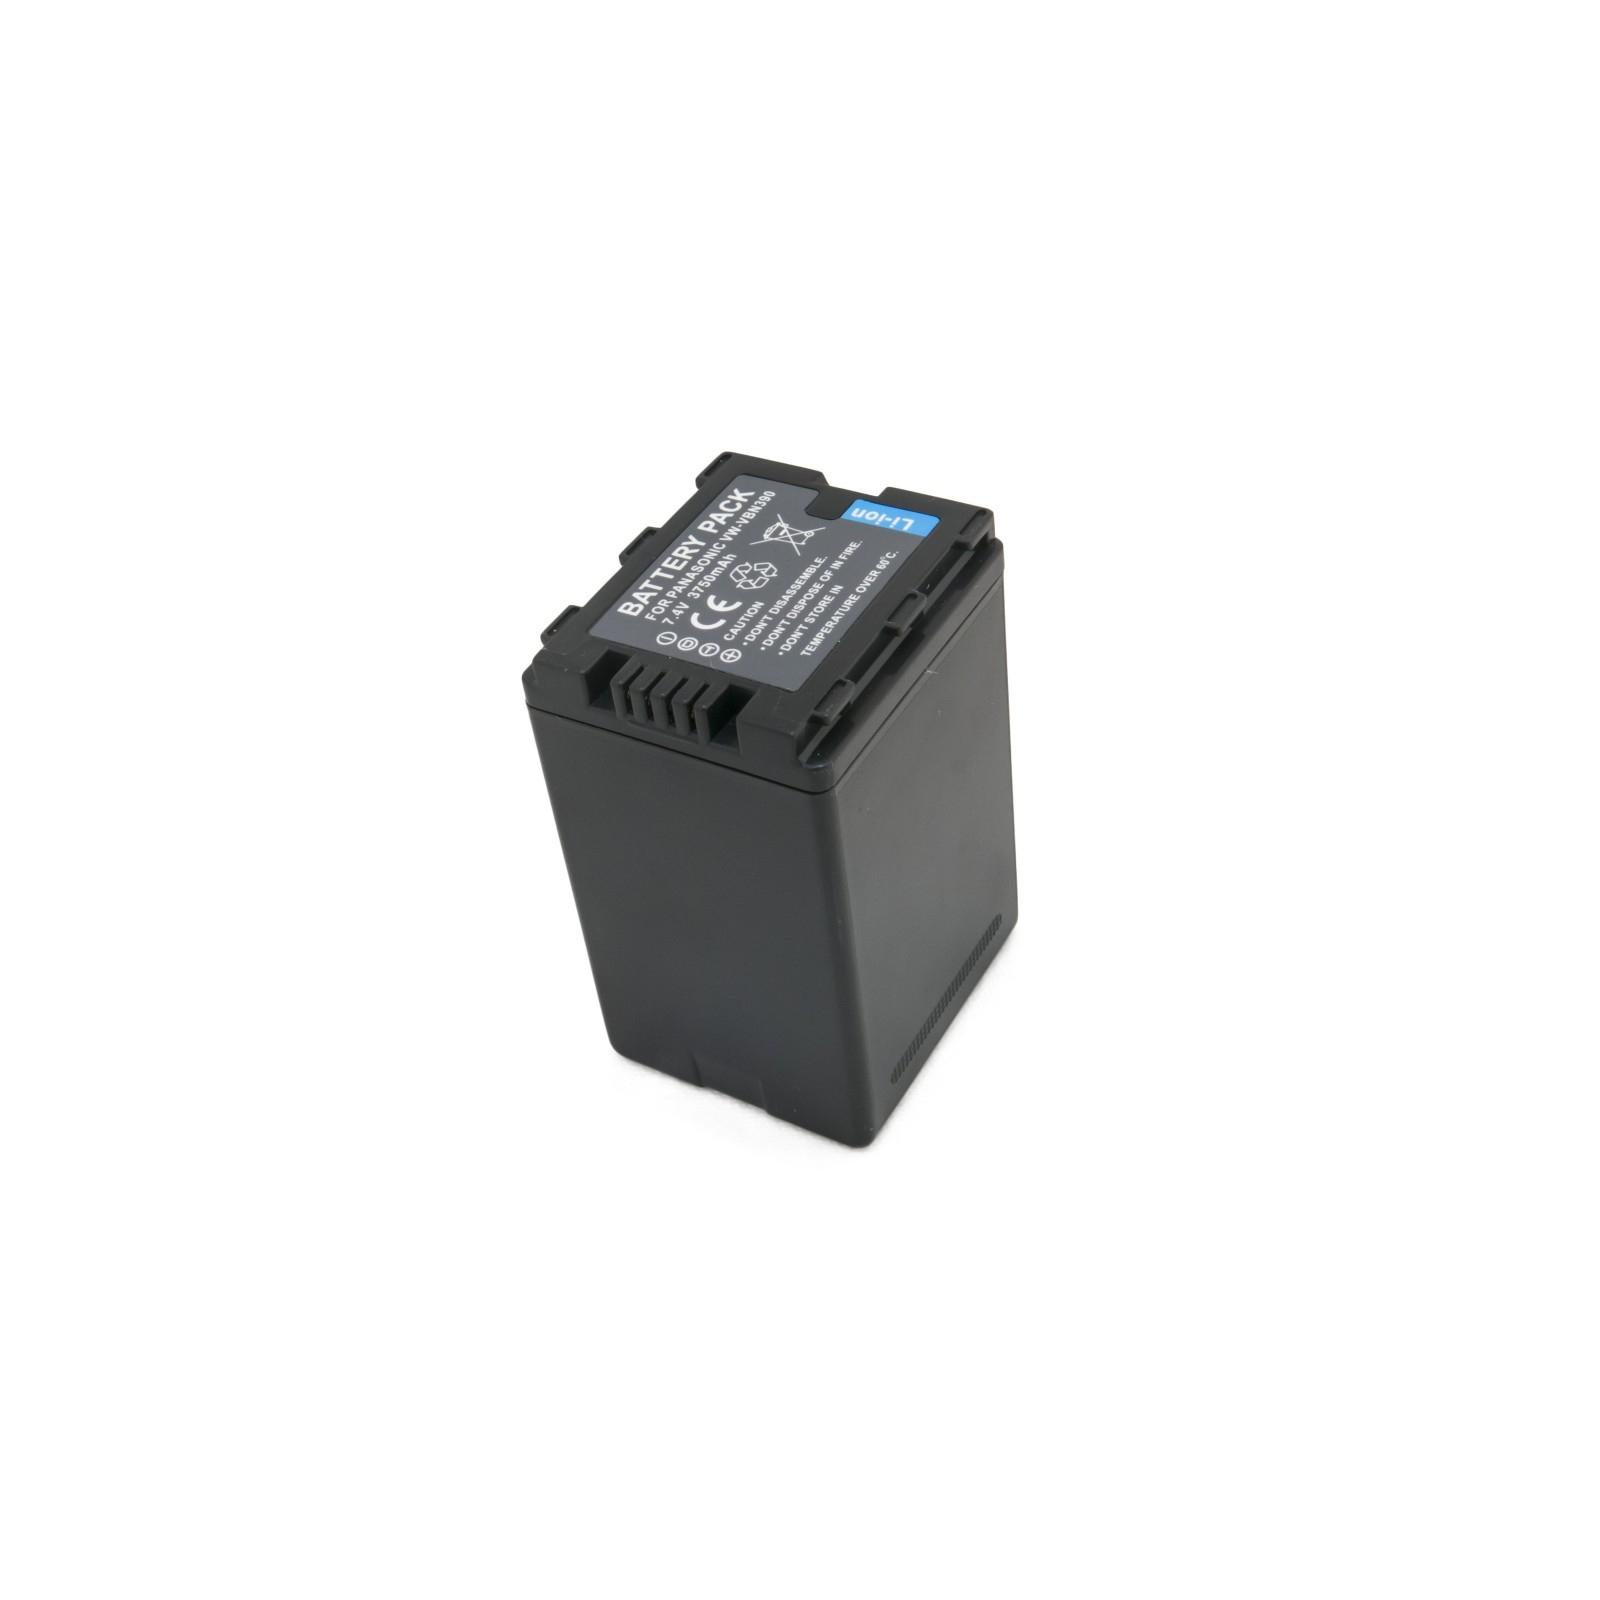 Аккумулятор к фото/видео EXTRADIGITAL Panasonic VW-VBN390 (DV00DV1365) изображение 4